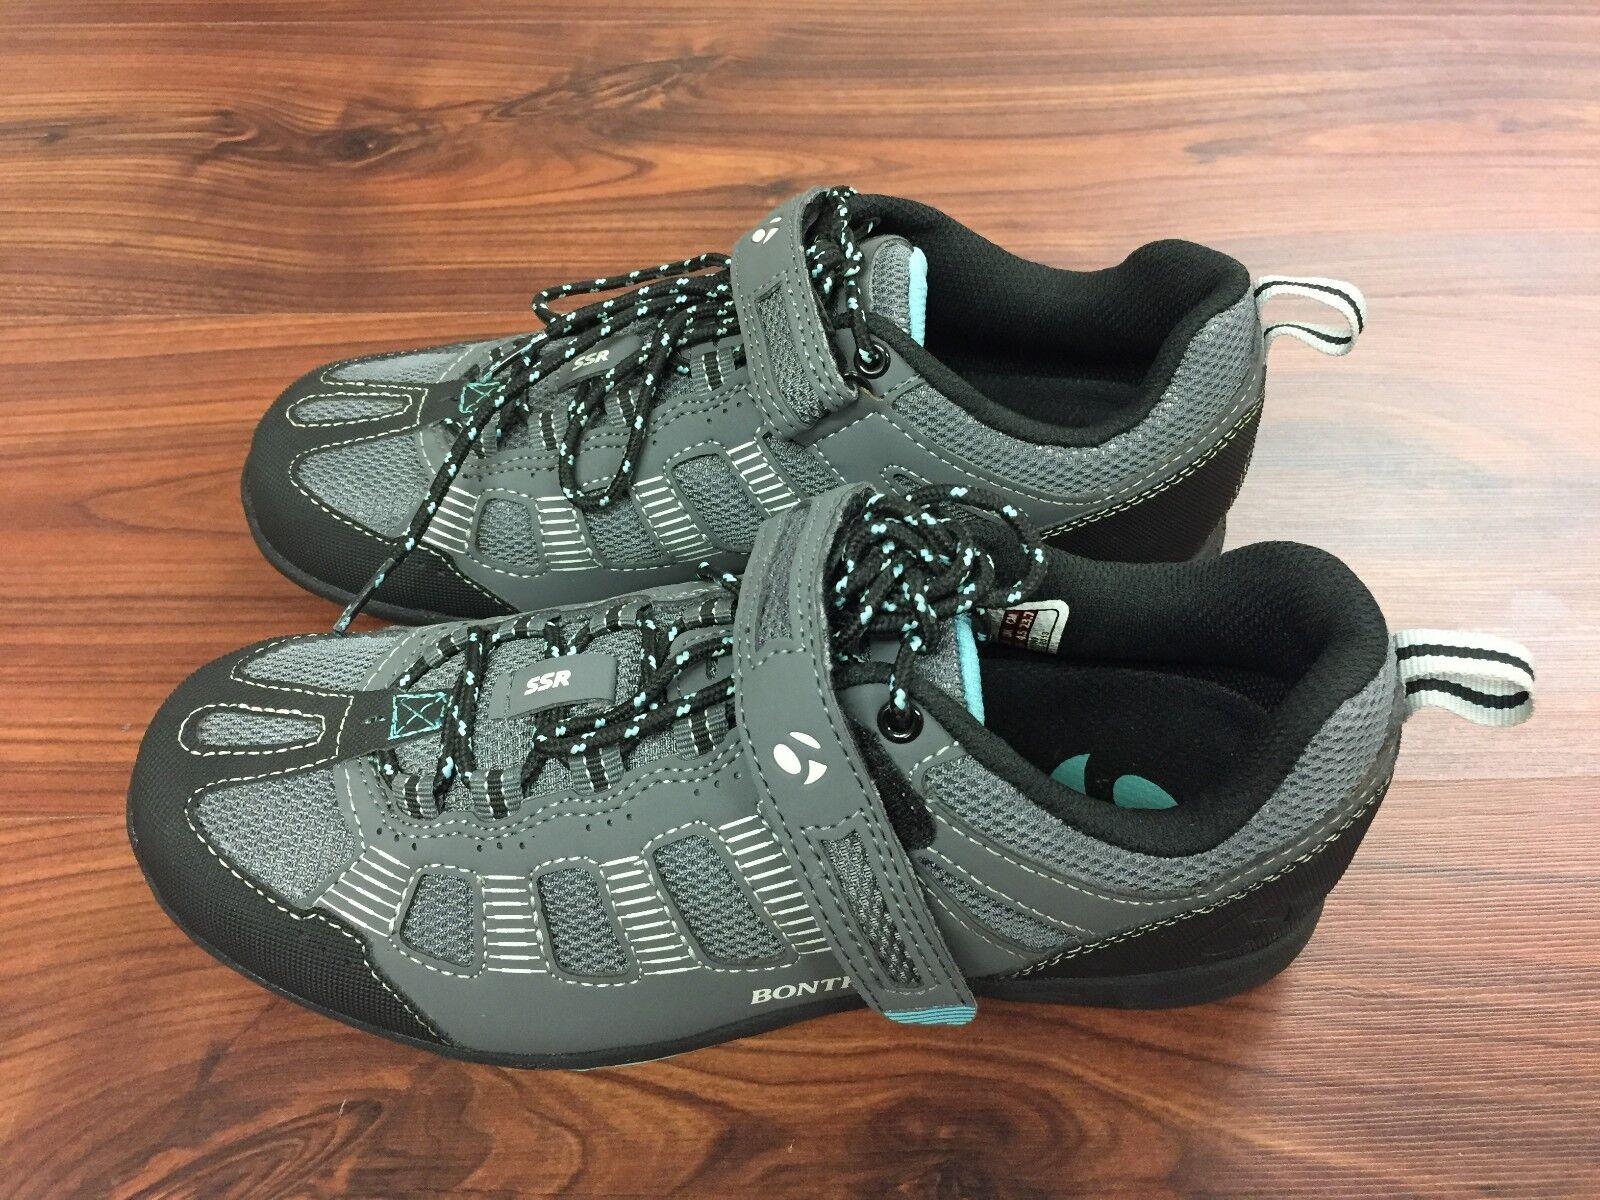 Bontrager WSD Inform SSR  Mountain Bike zapatos talla EU 37 nos 5.5 Nuevo  ahorra hasta un 80%